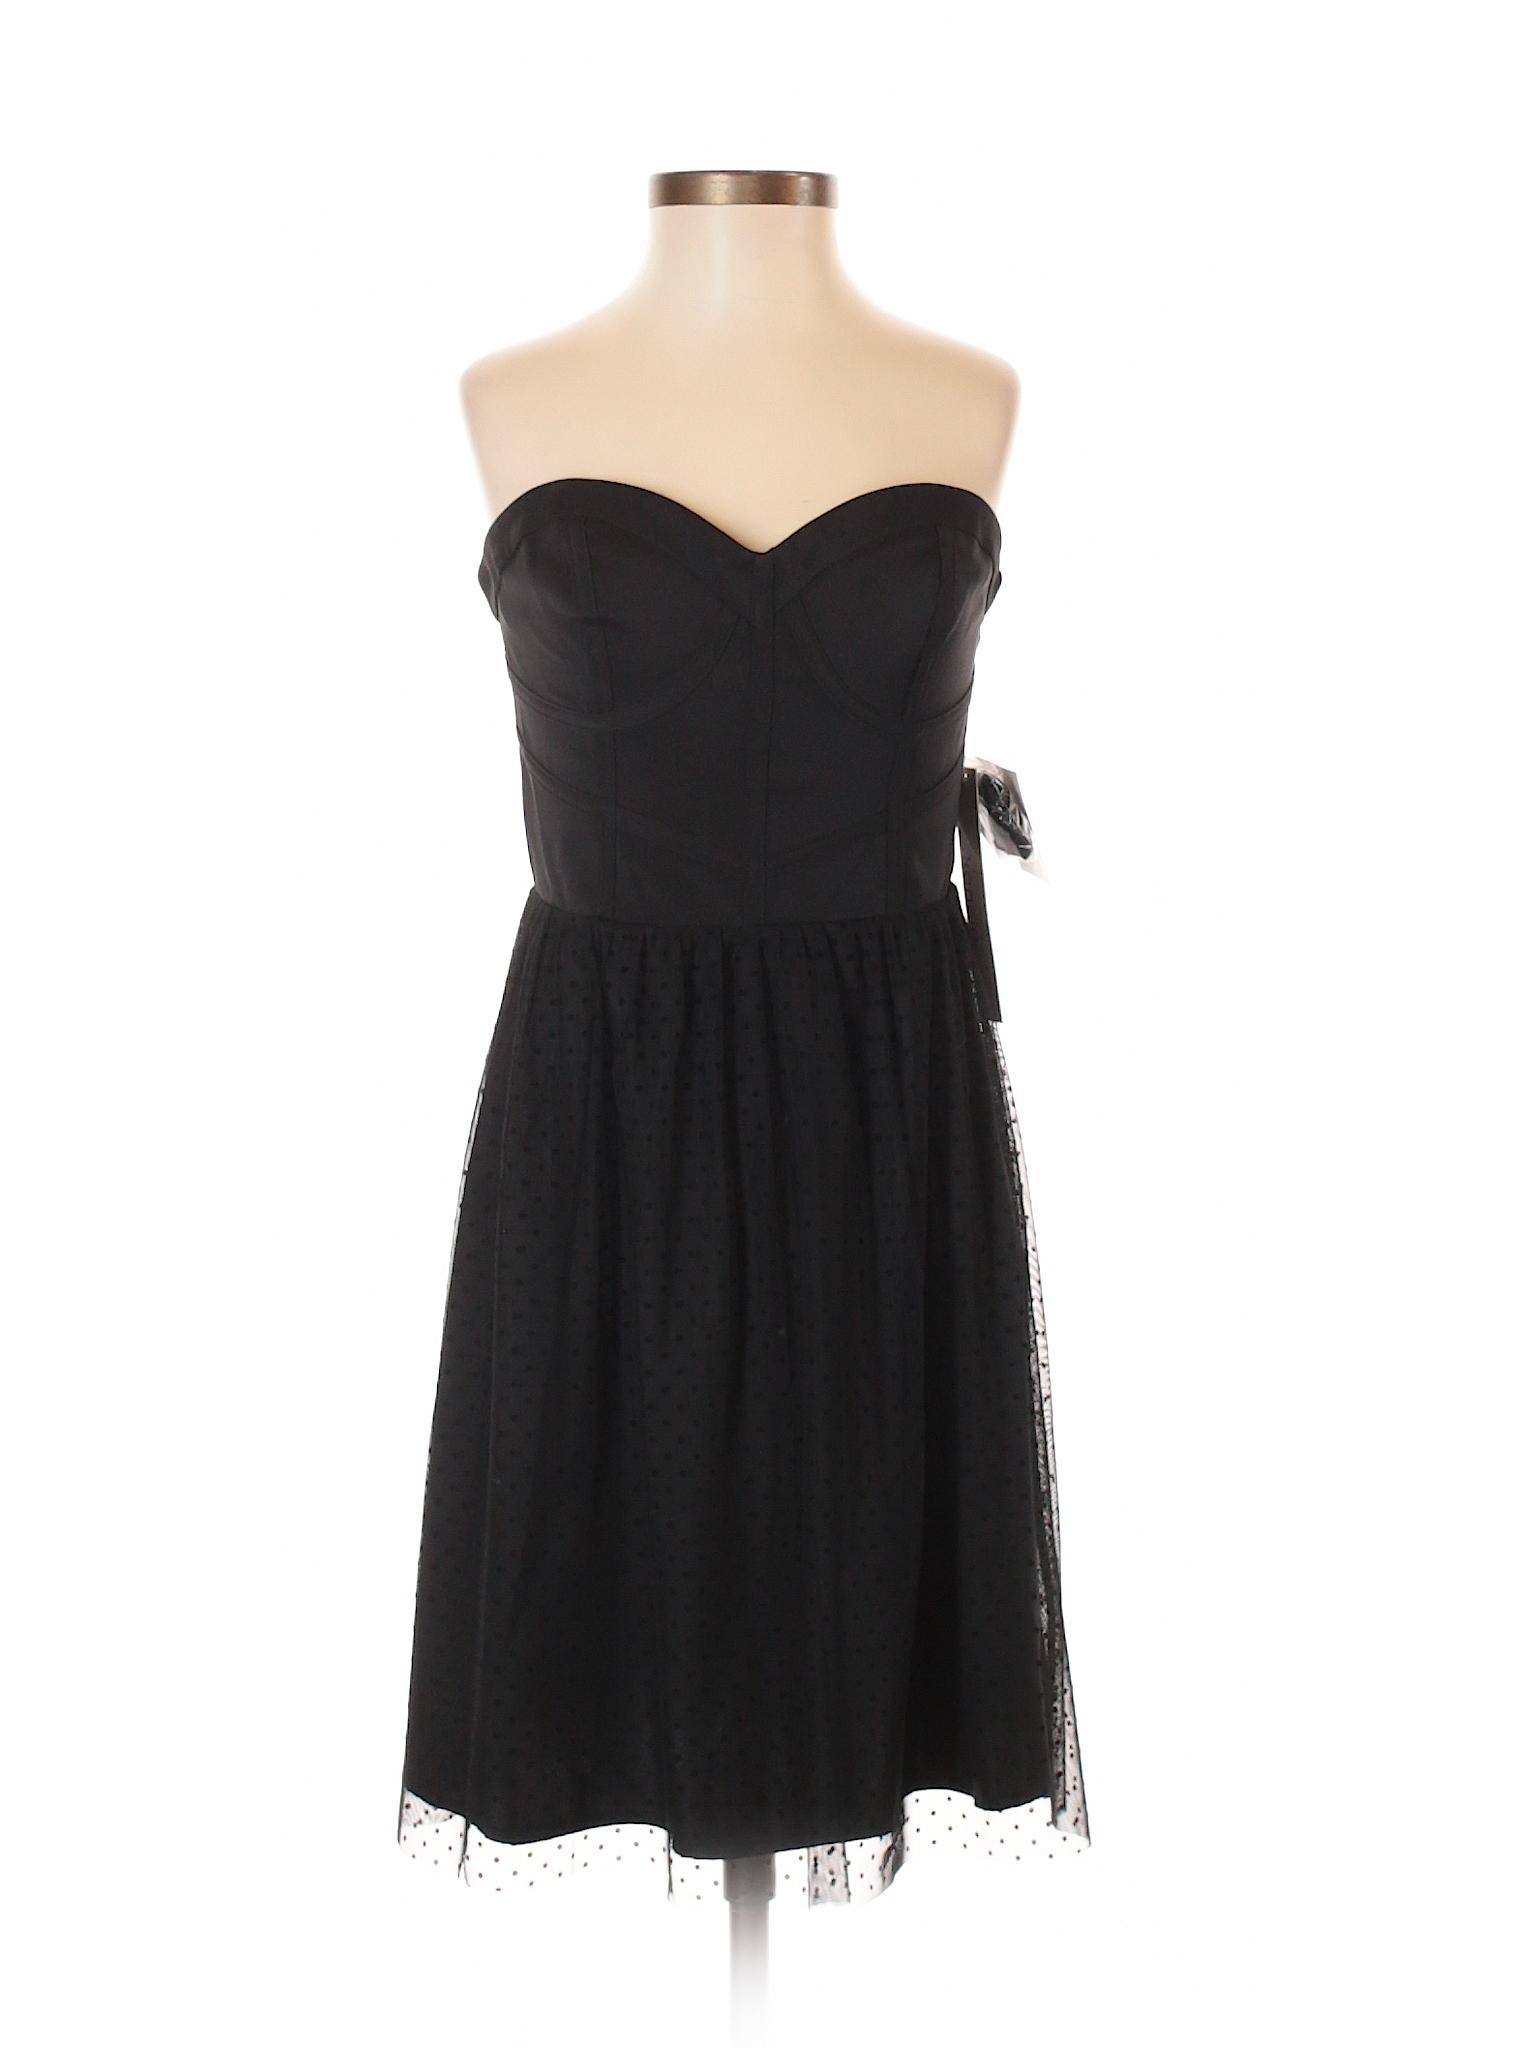 Casual Casual winter Dress winter Kensie Kensie Boutique Boutique vxw4qvY